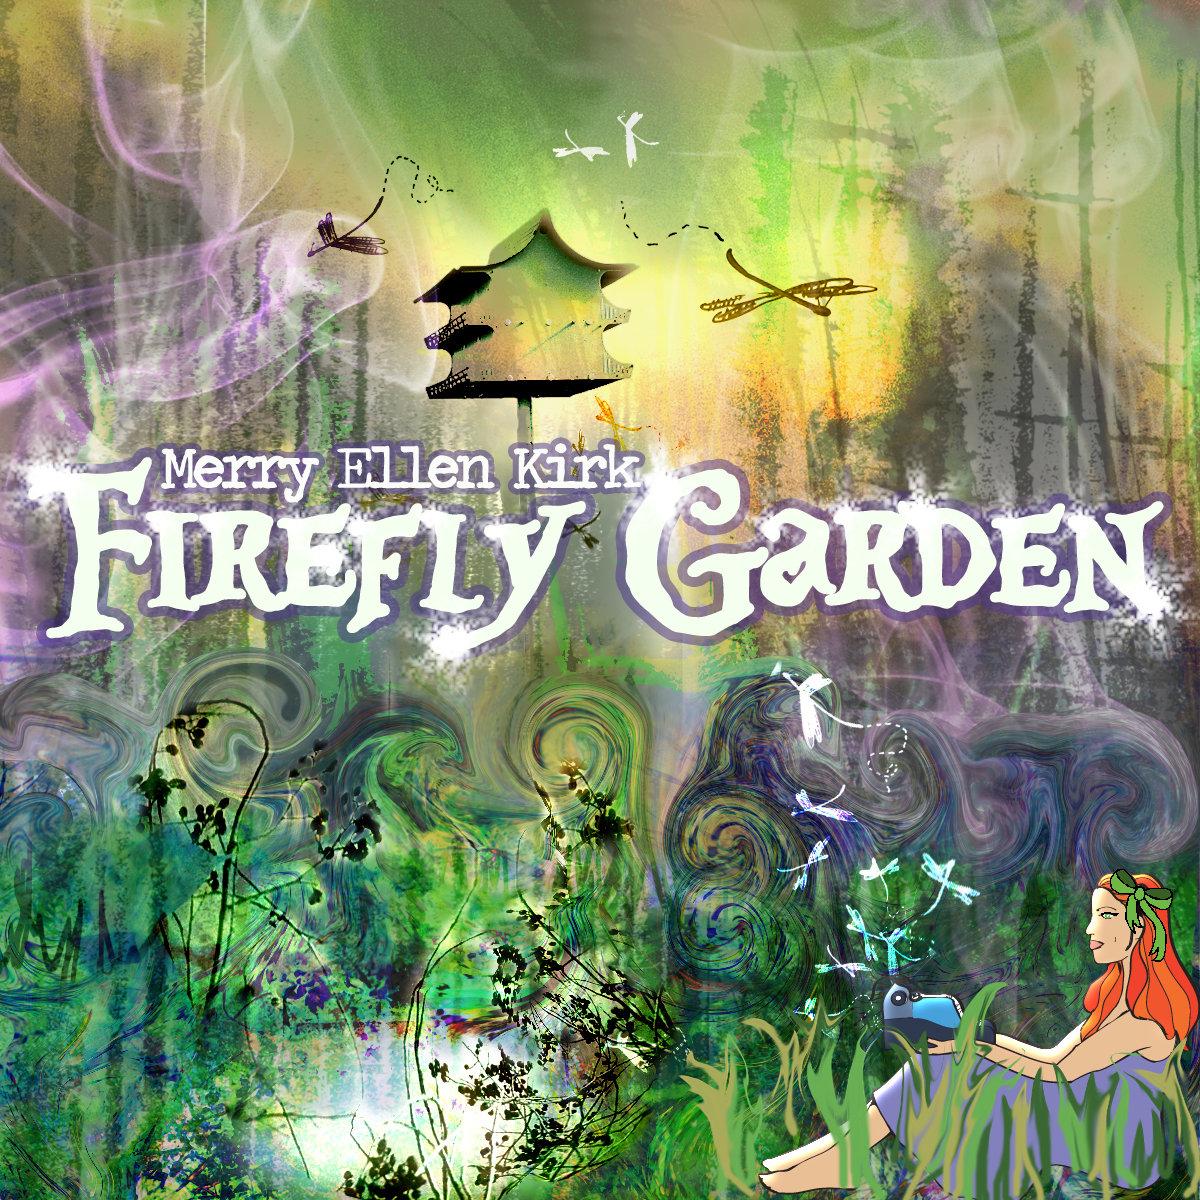 Firefly Garden